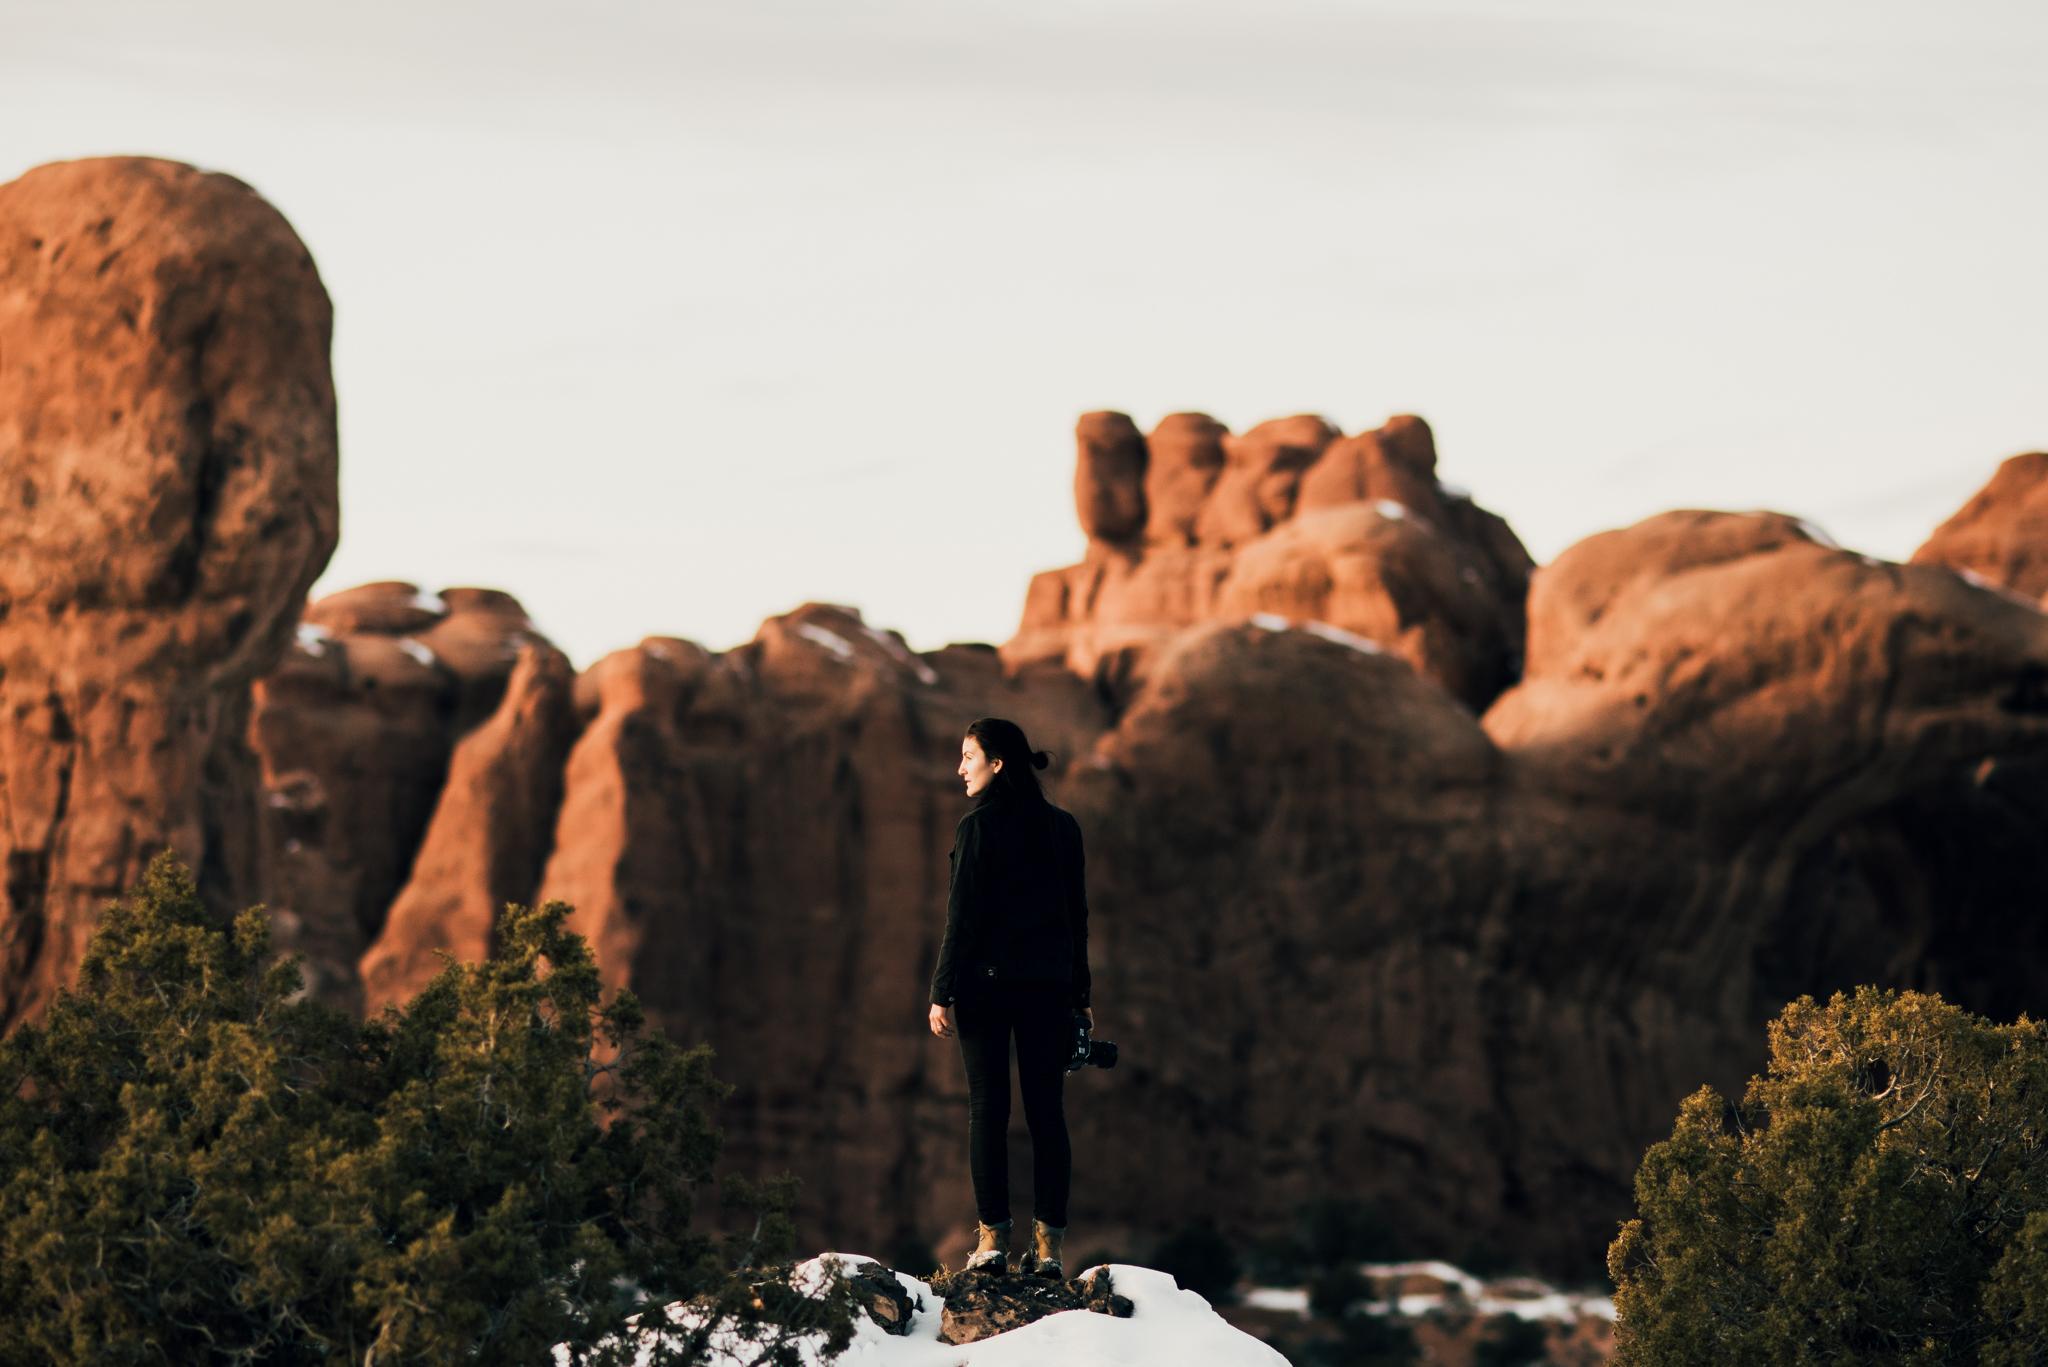 Isaiah-&-Taylor-Photography---White-Sand-Dunes-23.jpg